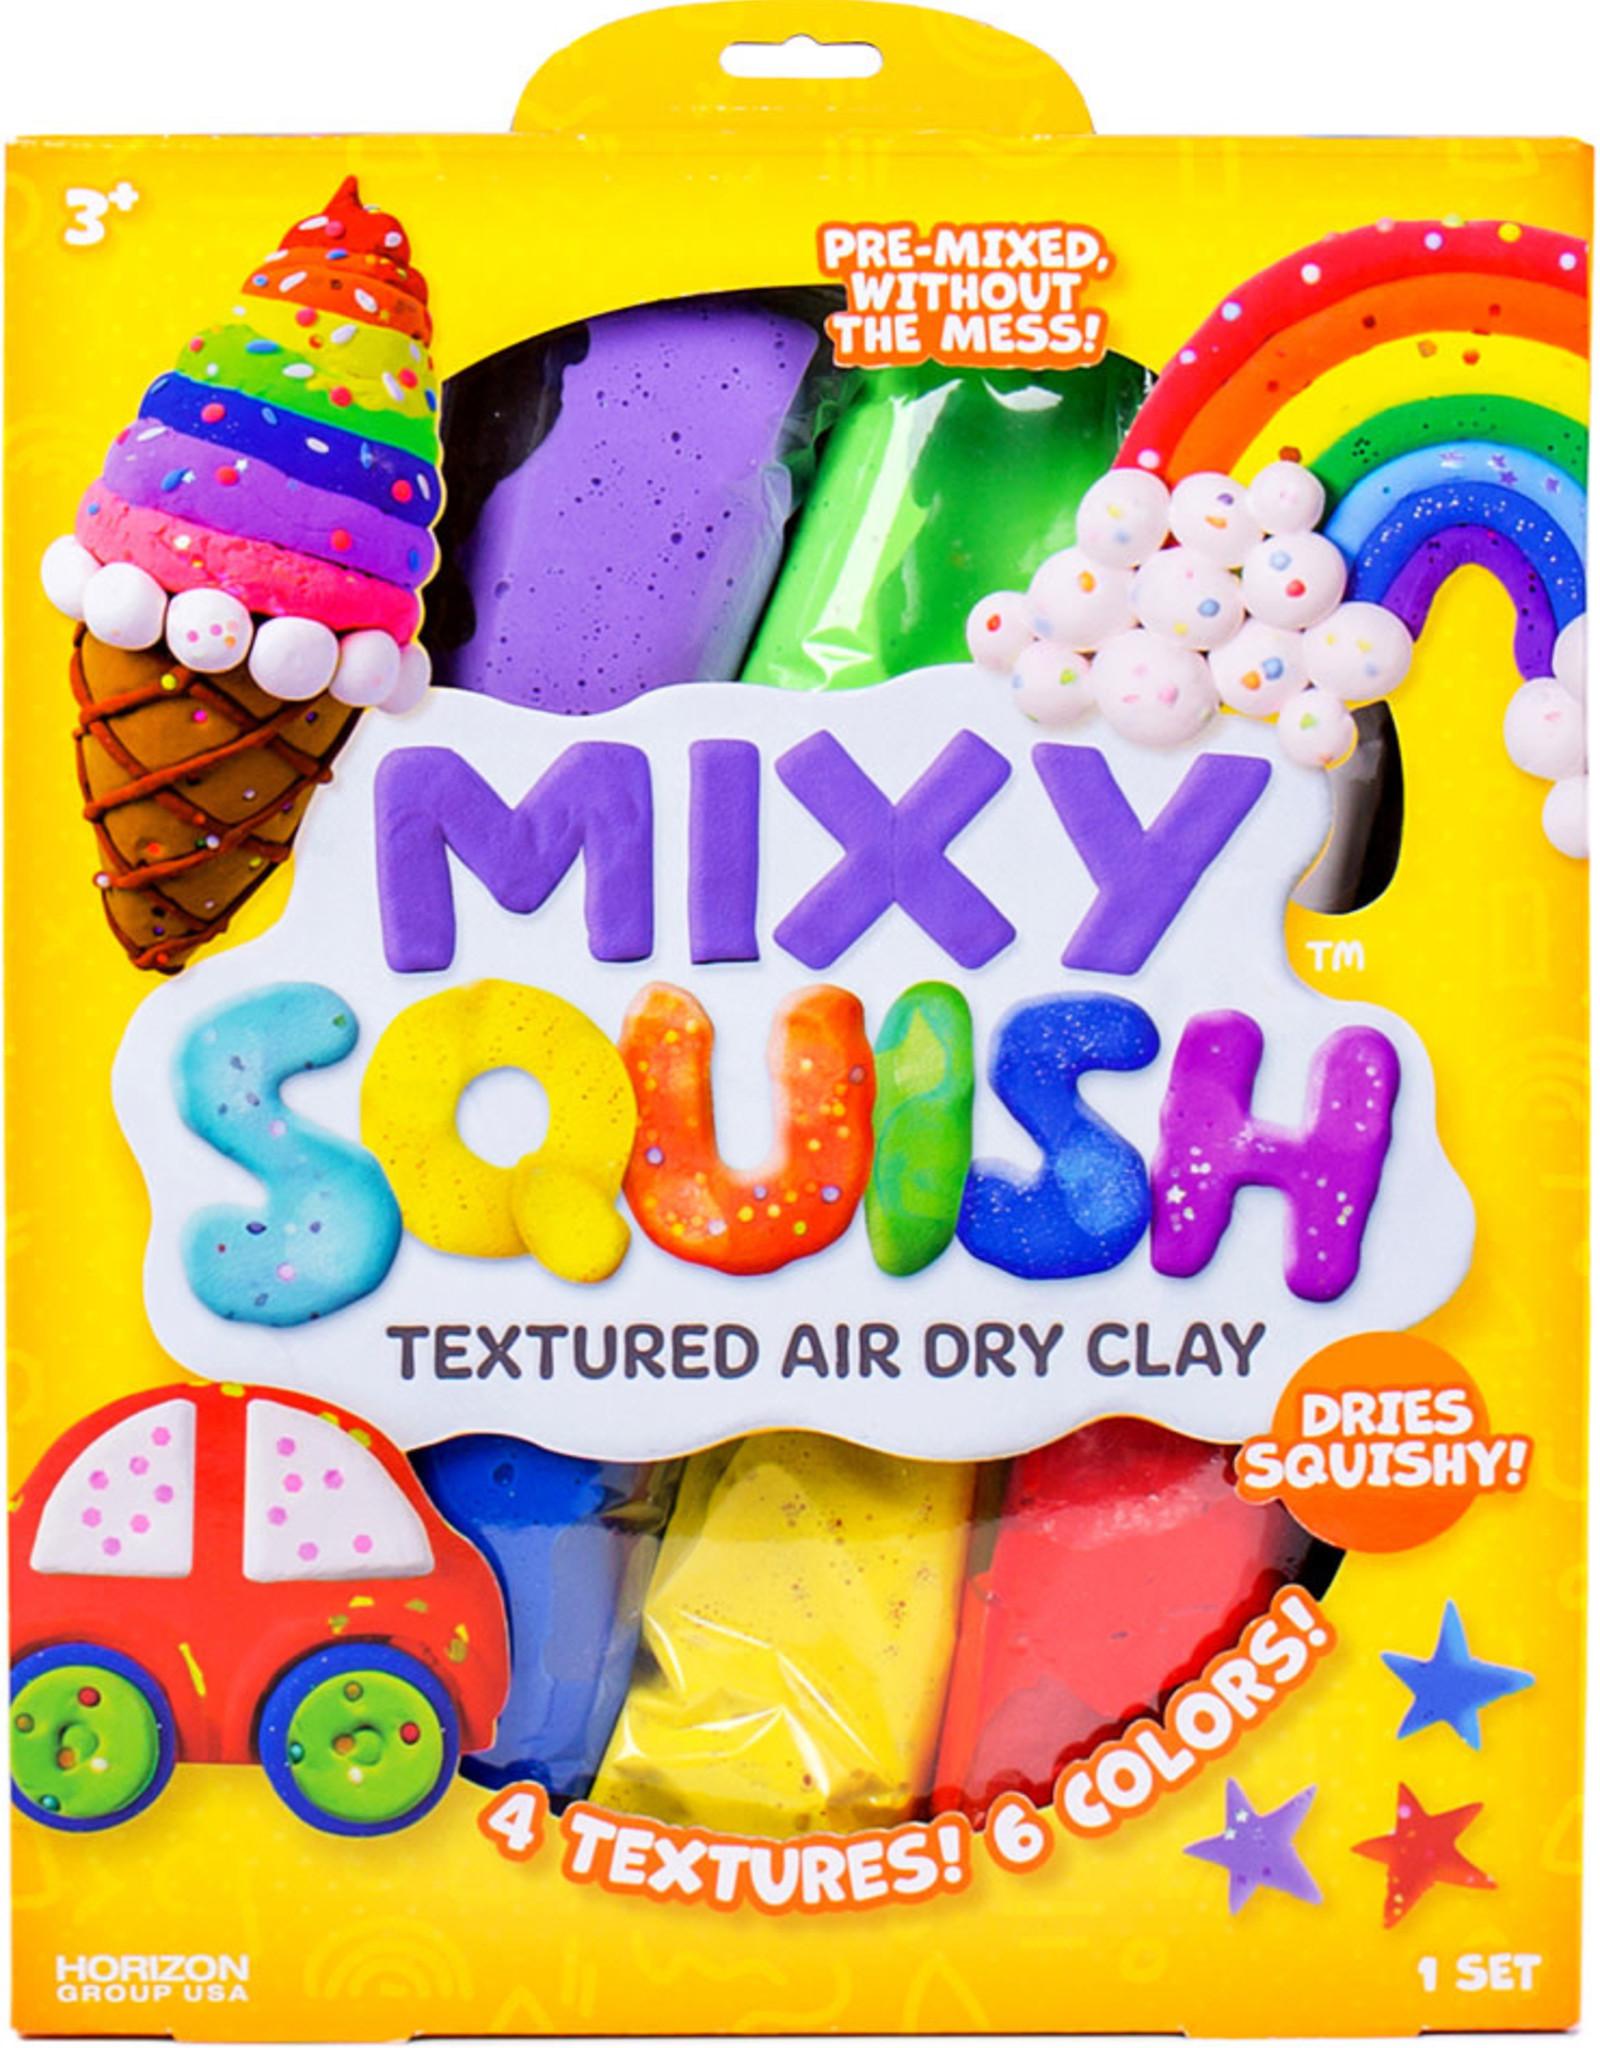 Mixy Squishy Sculptures Class - August 10 - Hammonton